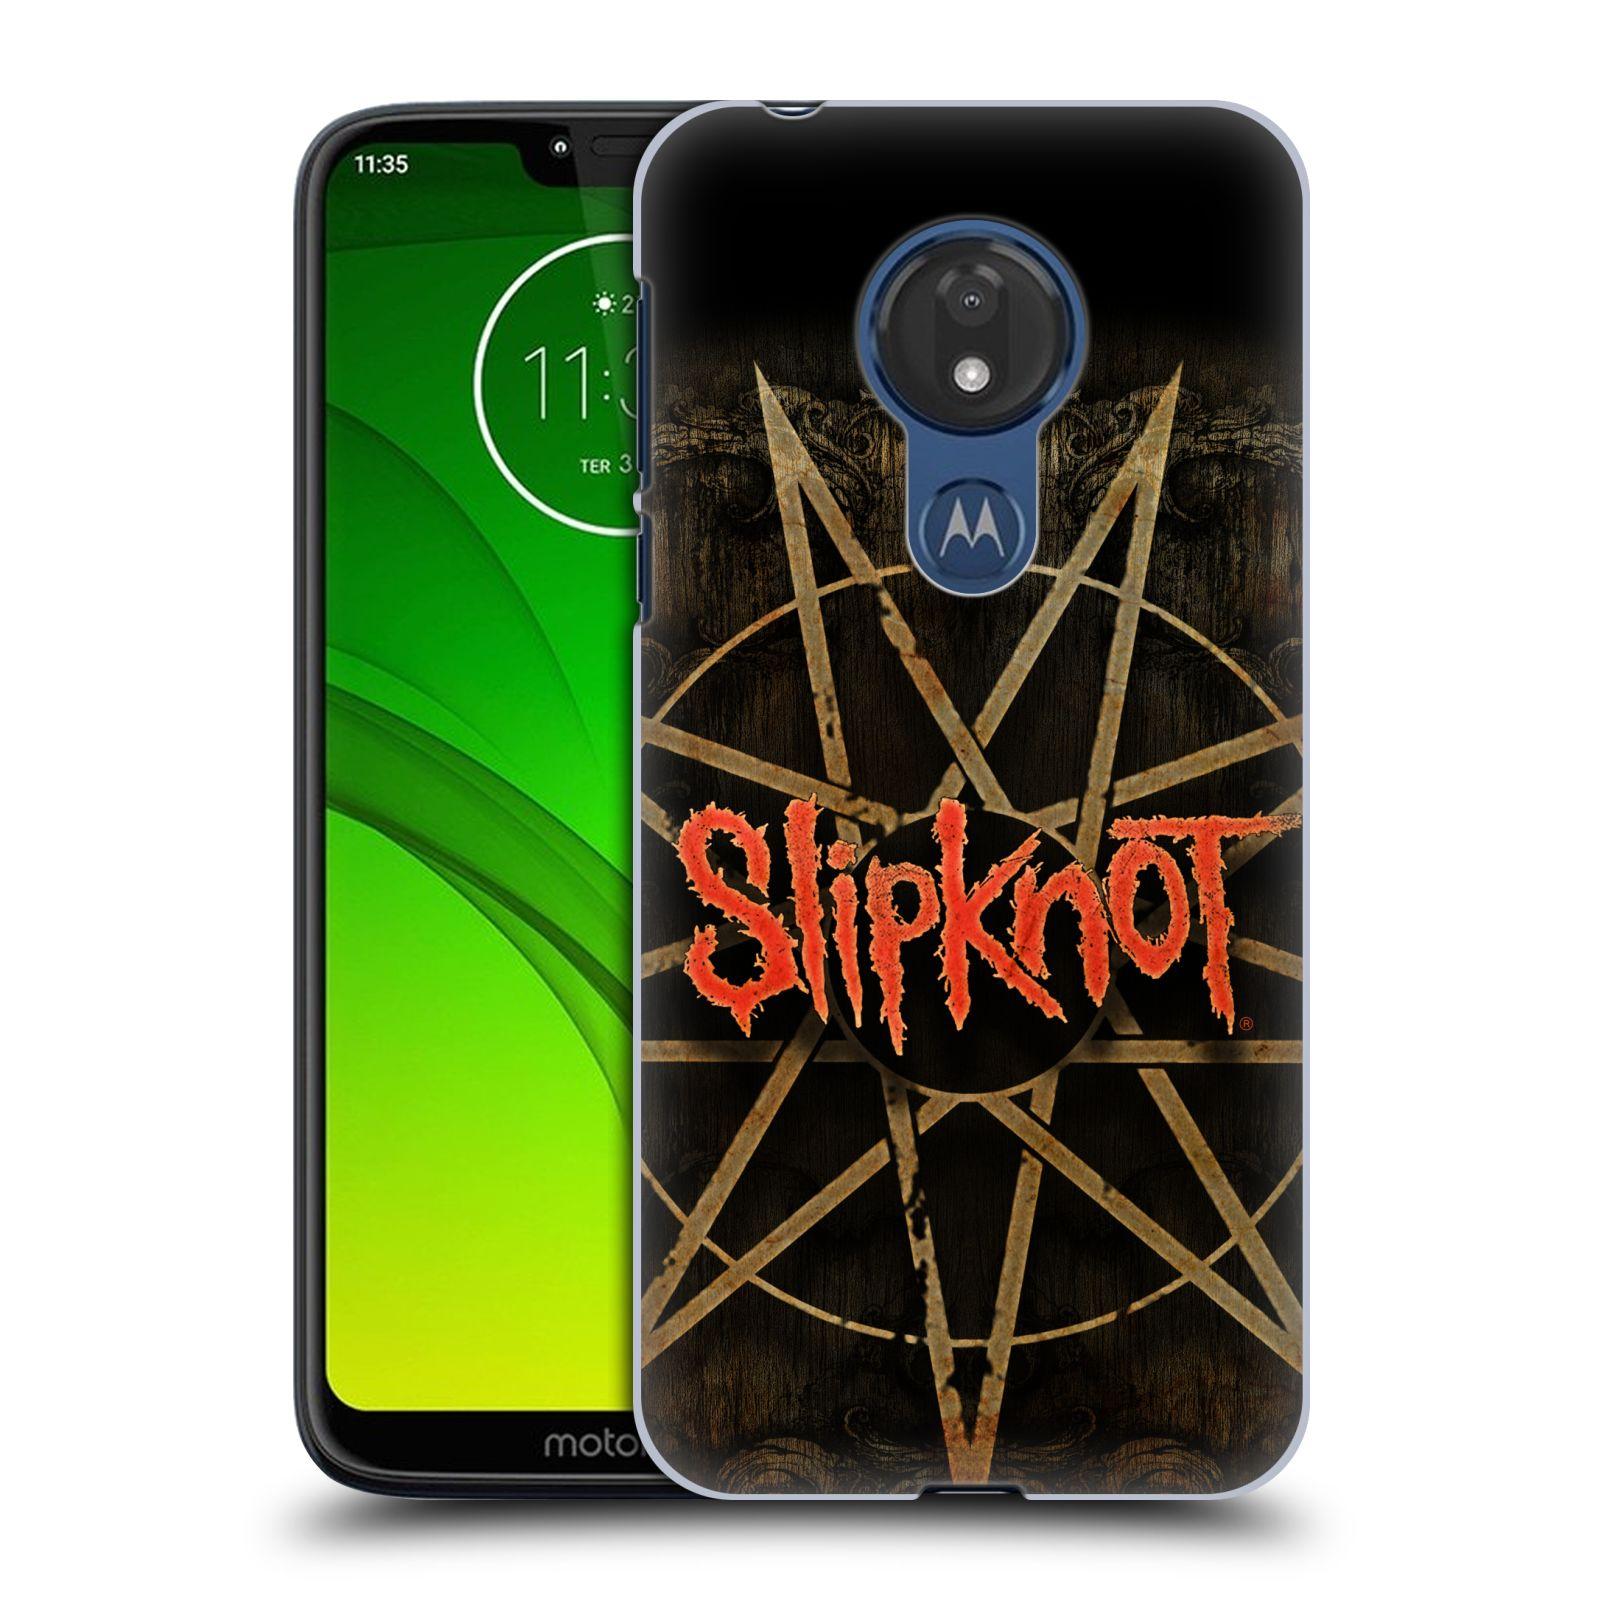 Plastové pouzdro na mobil Motorola Moto G7 Power - Head Case - Slipknot - Znak